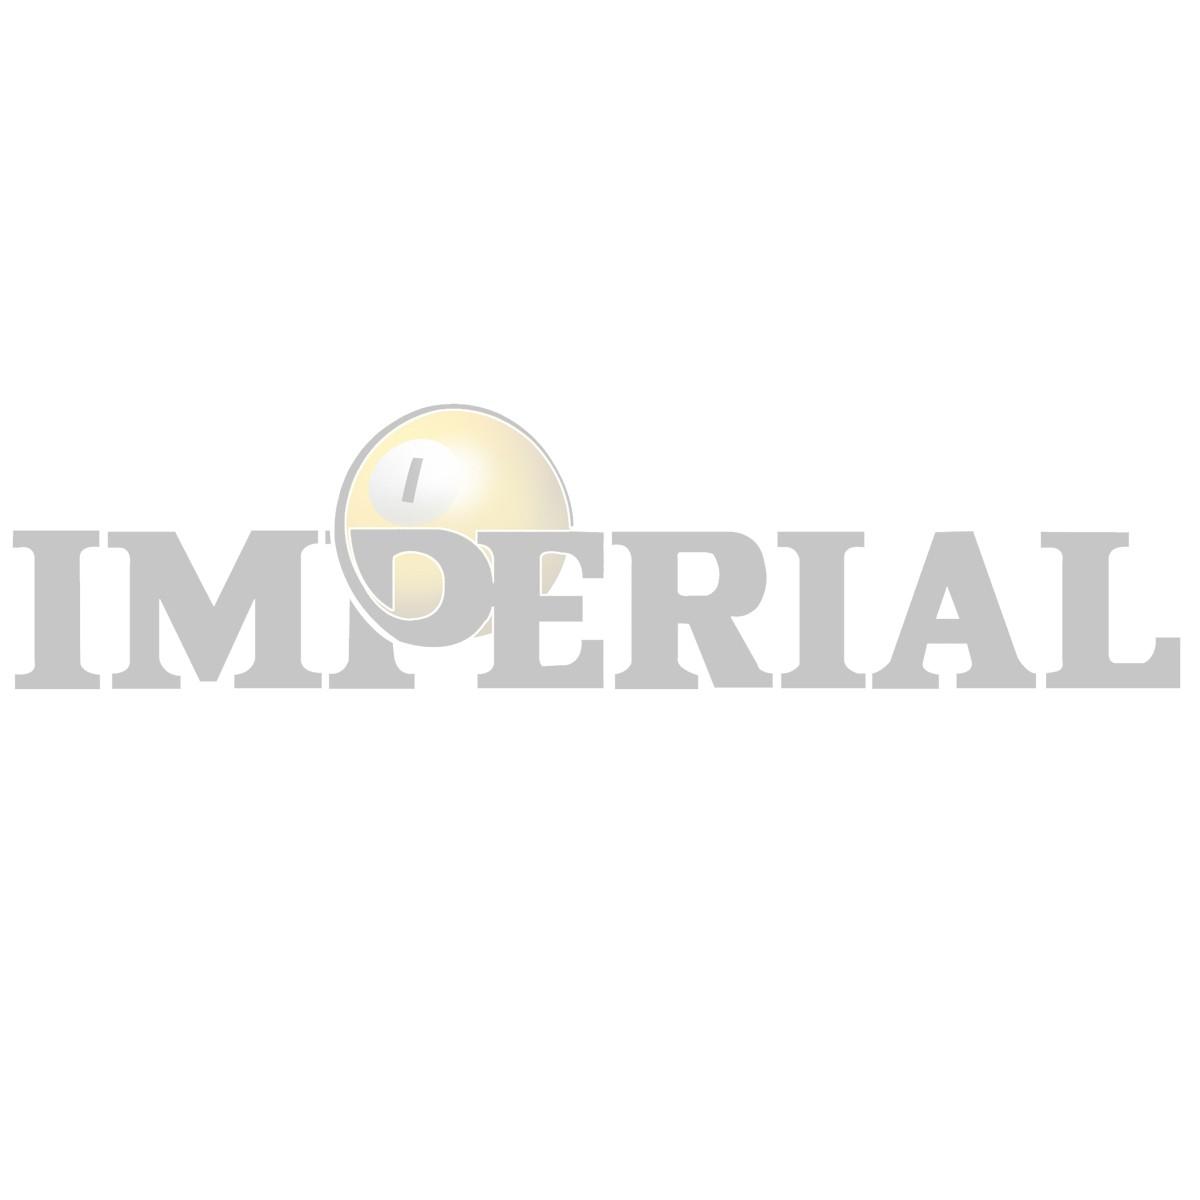 MICHIGAN STATE PUB CAPTAINS CHAIR, WHITE